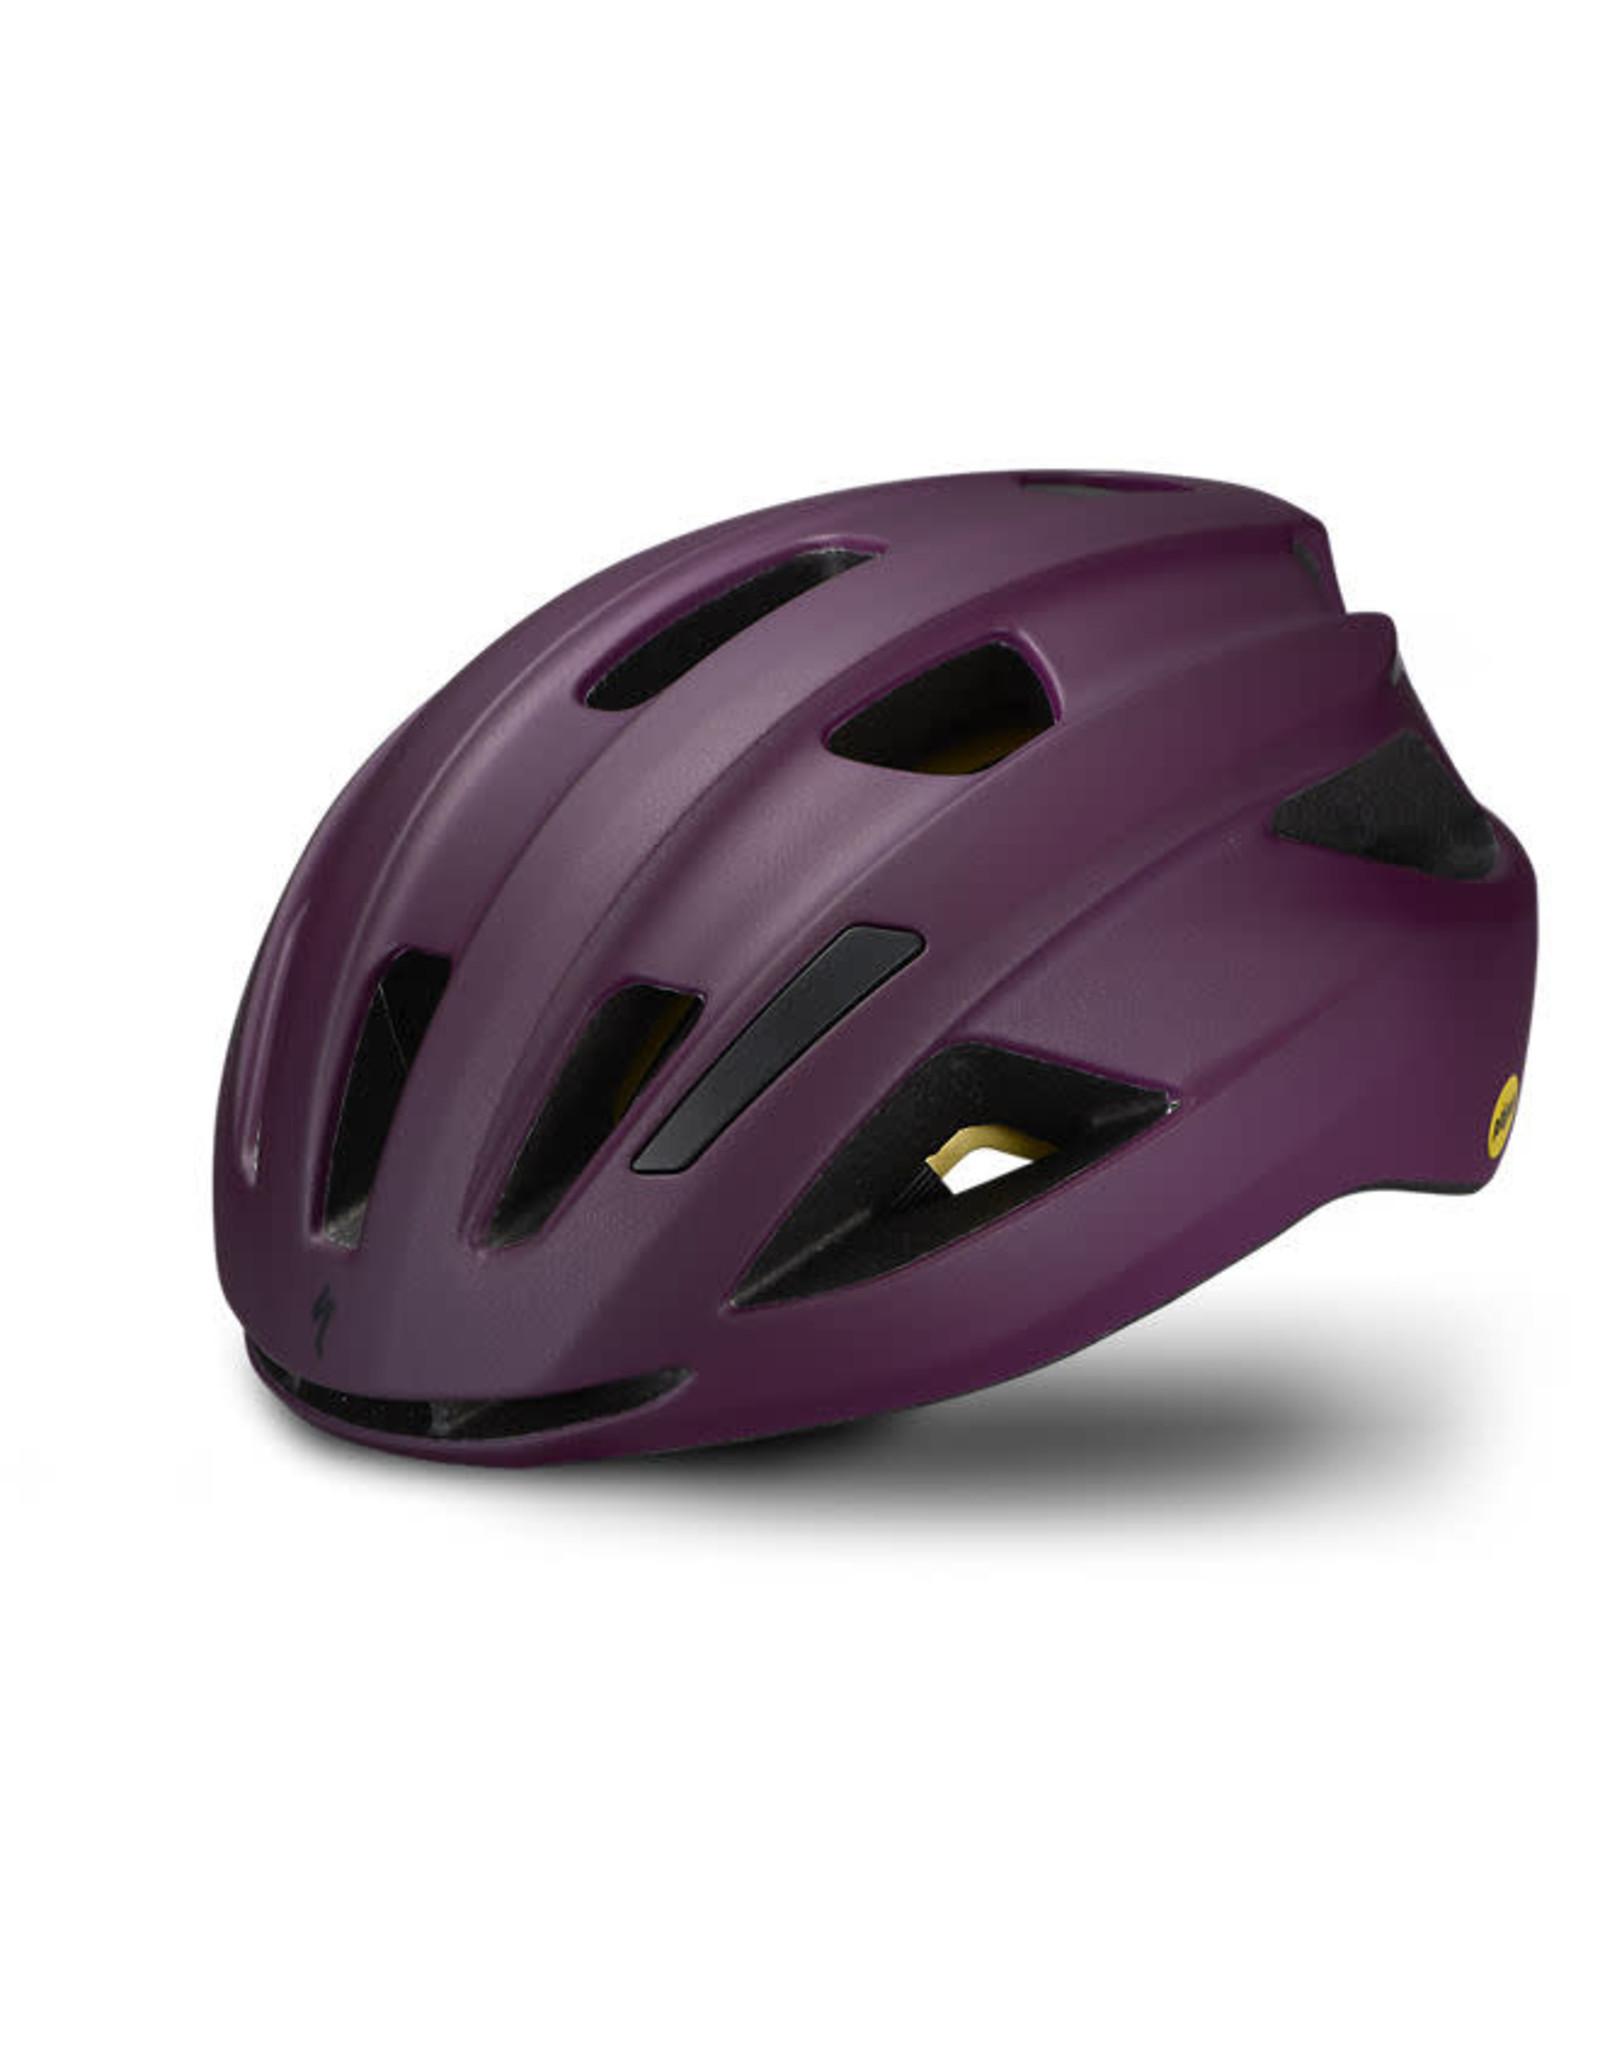 Specialized Specialized Align II Helmet MIPS Cast Berry S/M